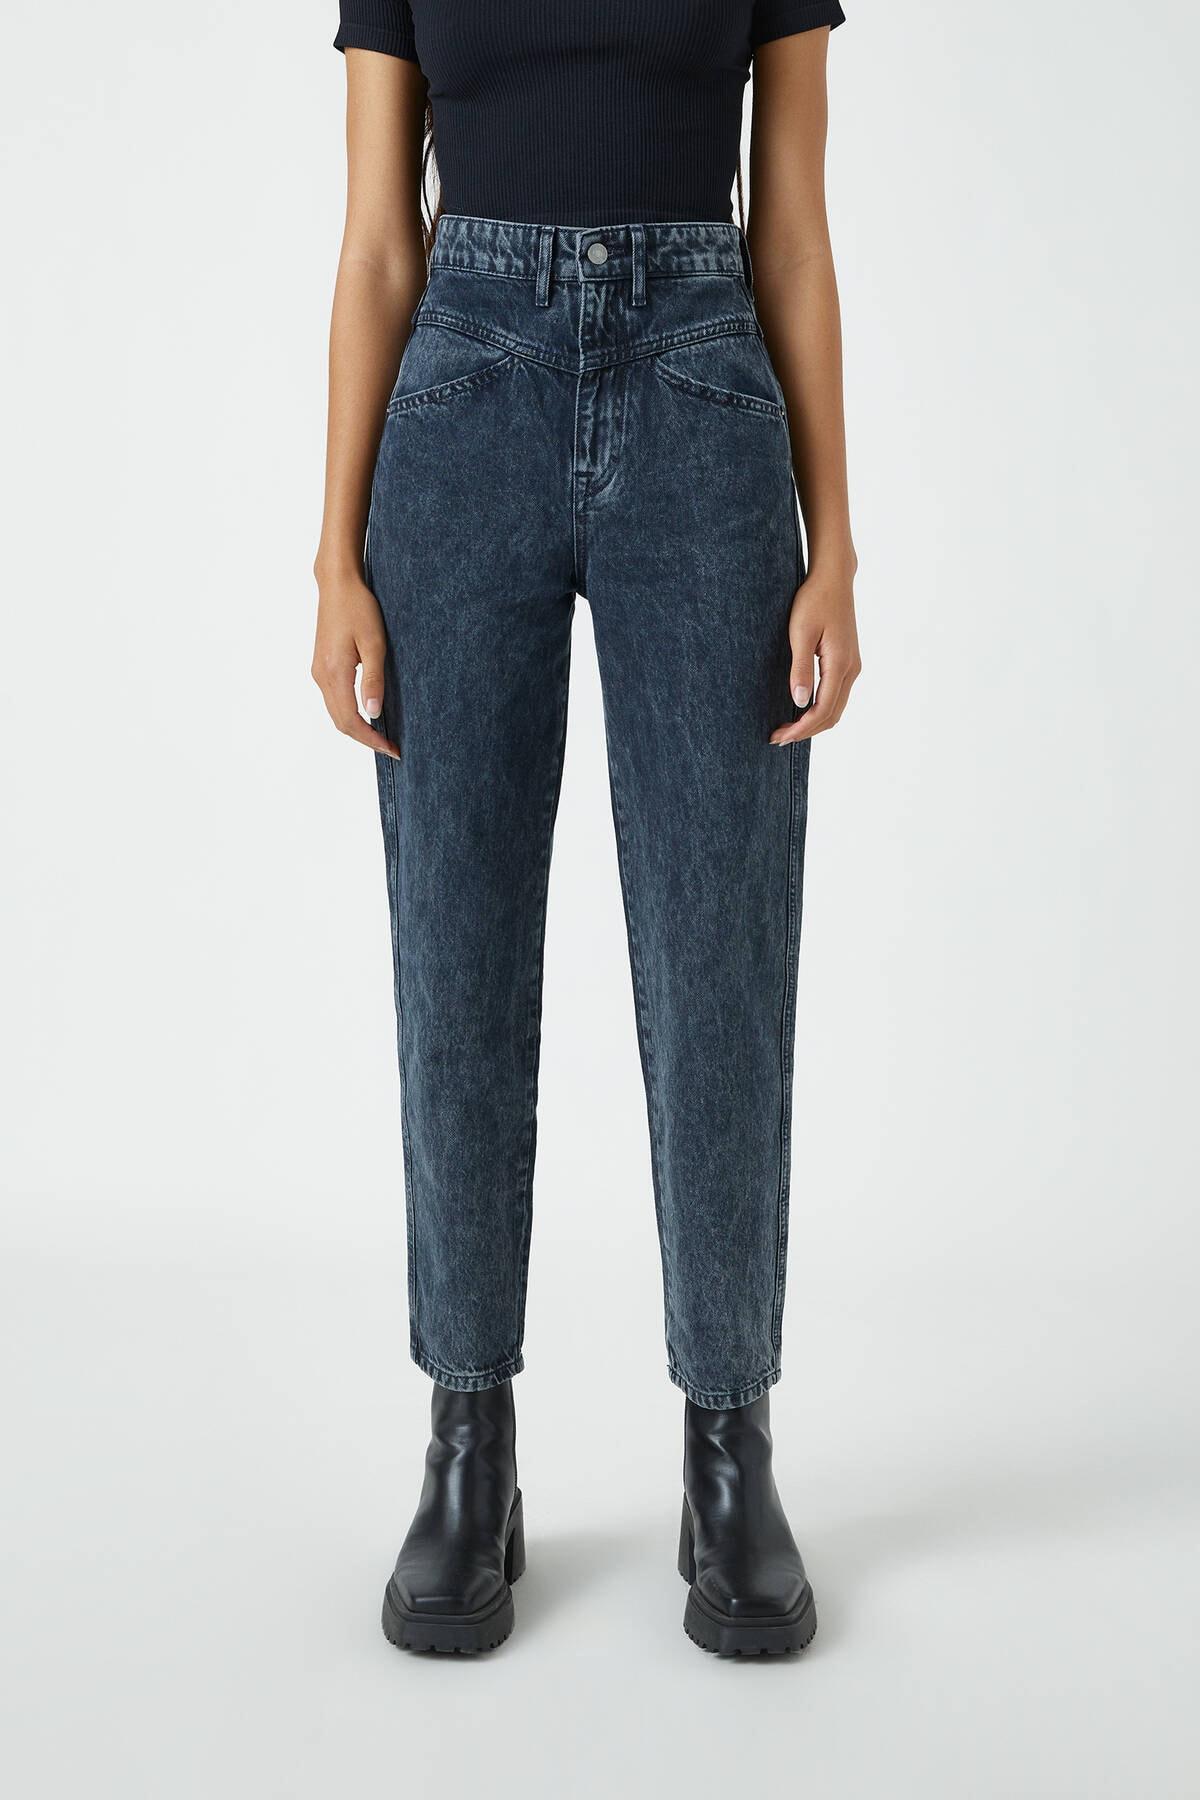 Pull & Bear Kadın Siyah Yüksek Bel Straight Fit Jean 09683335 2